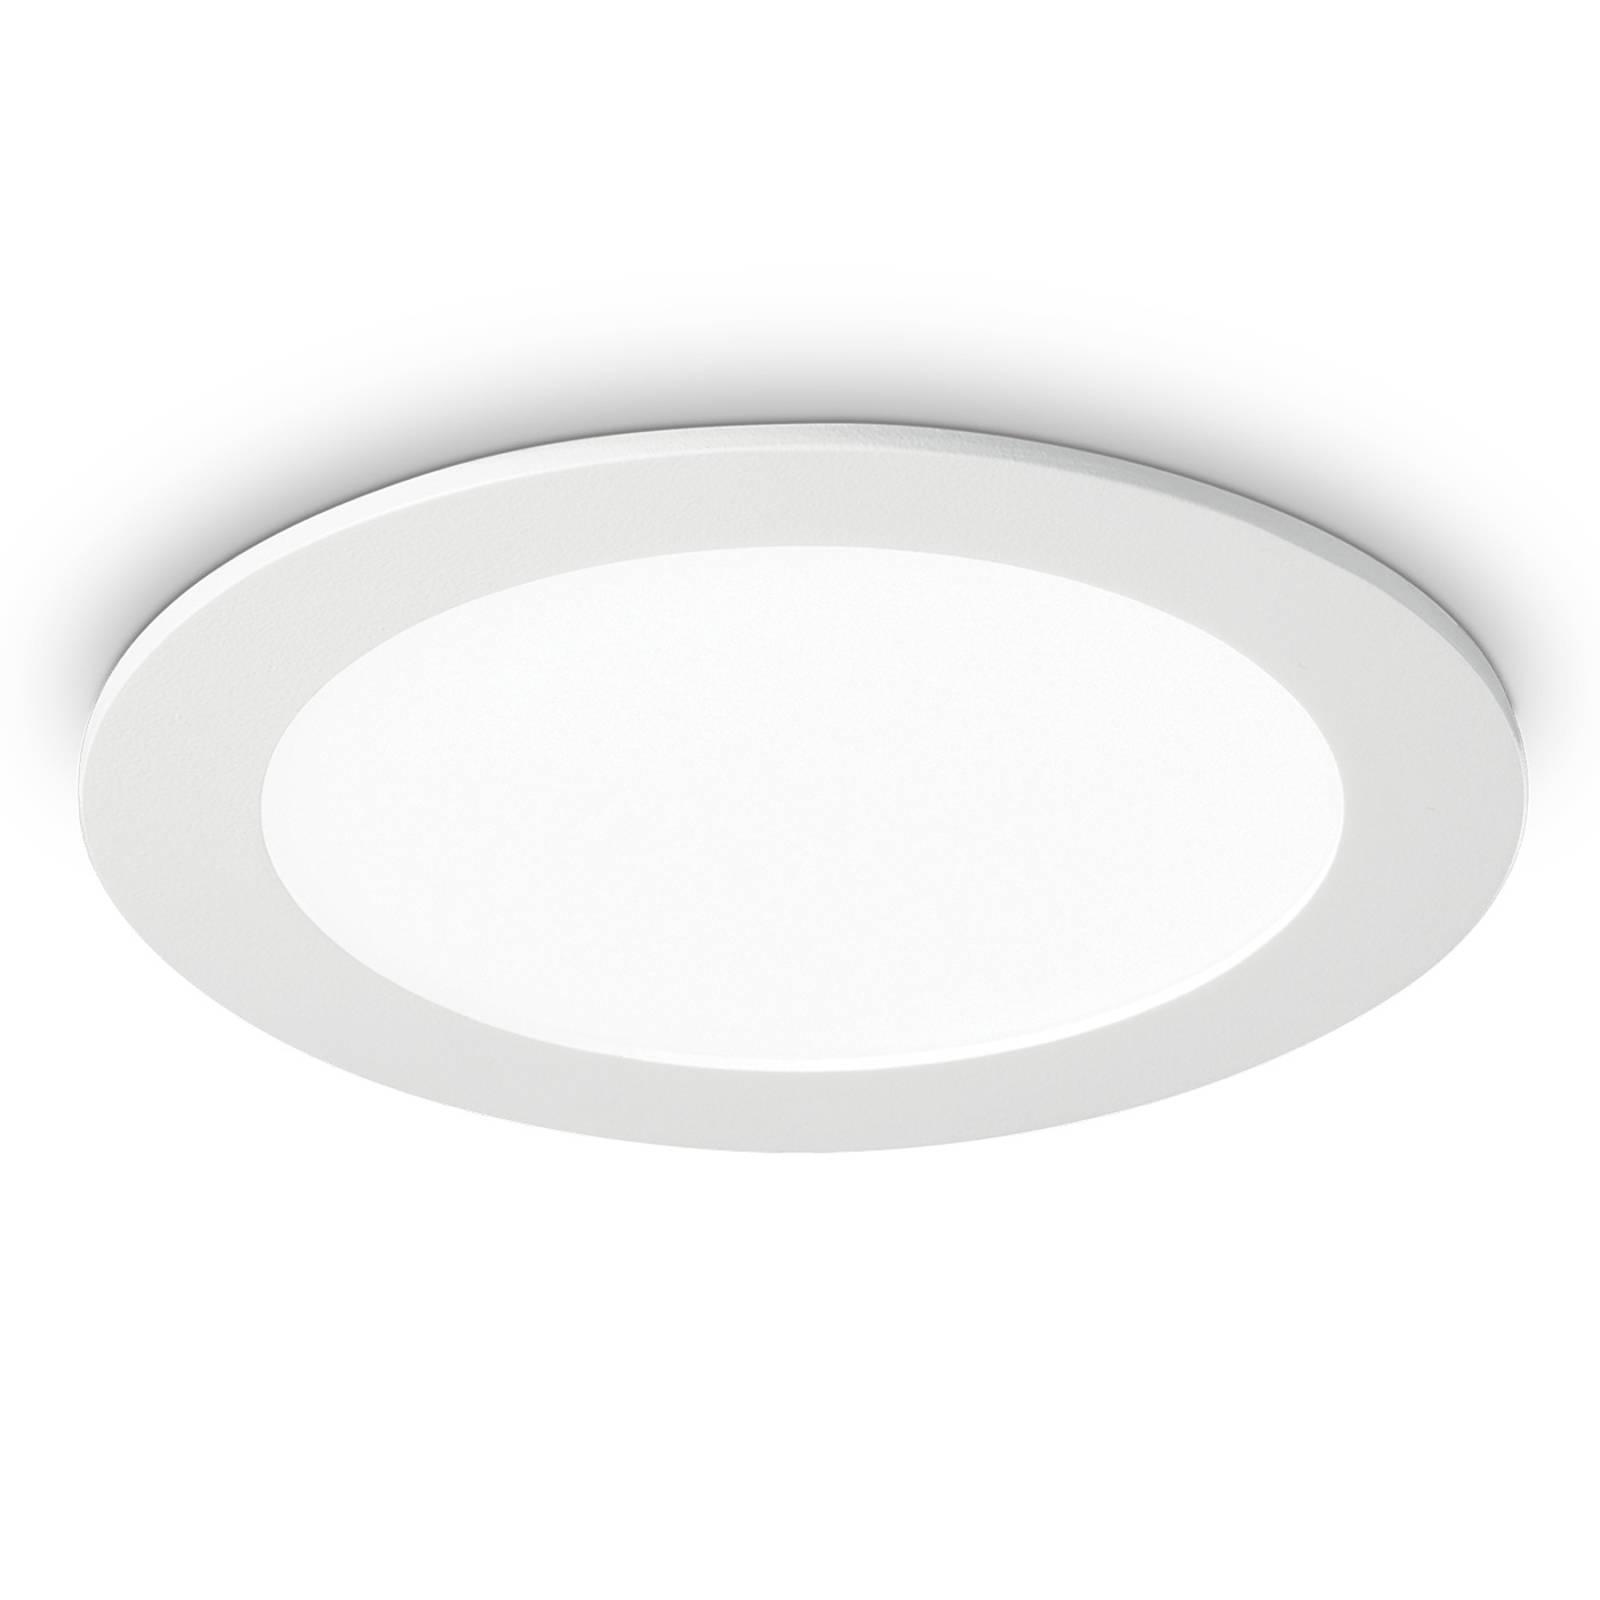 LED-kattouppovalaisin Groove round 3 000 K, 22,7cm